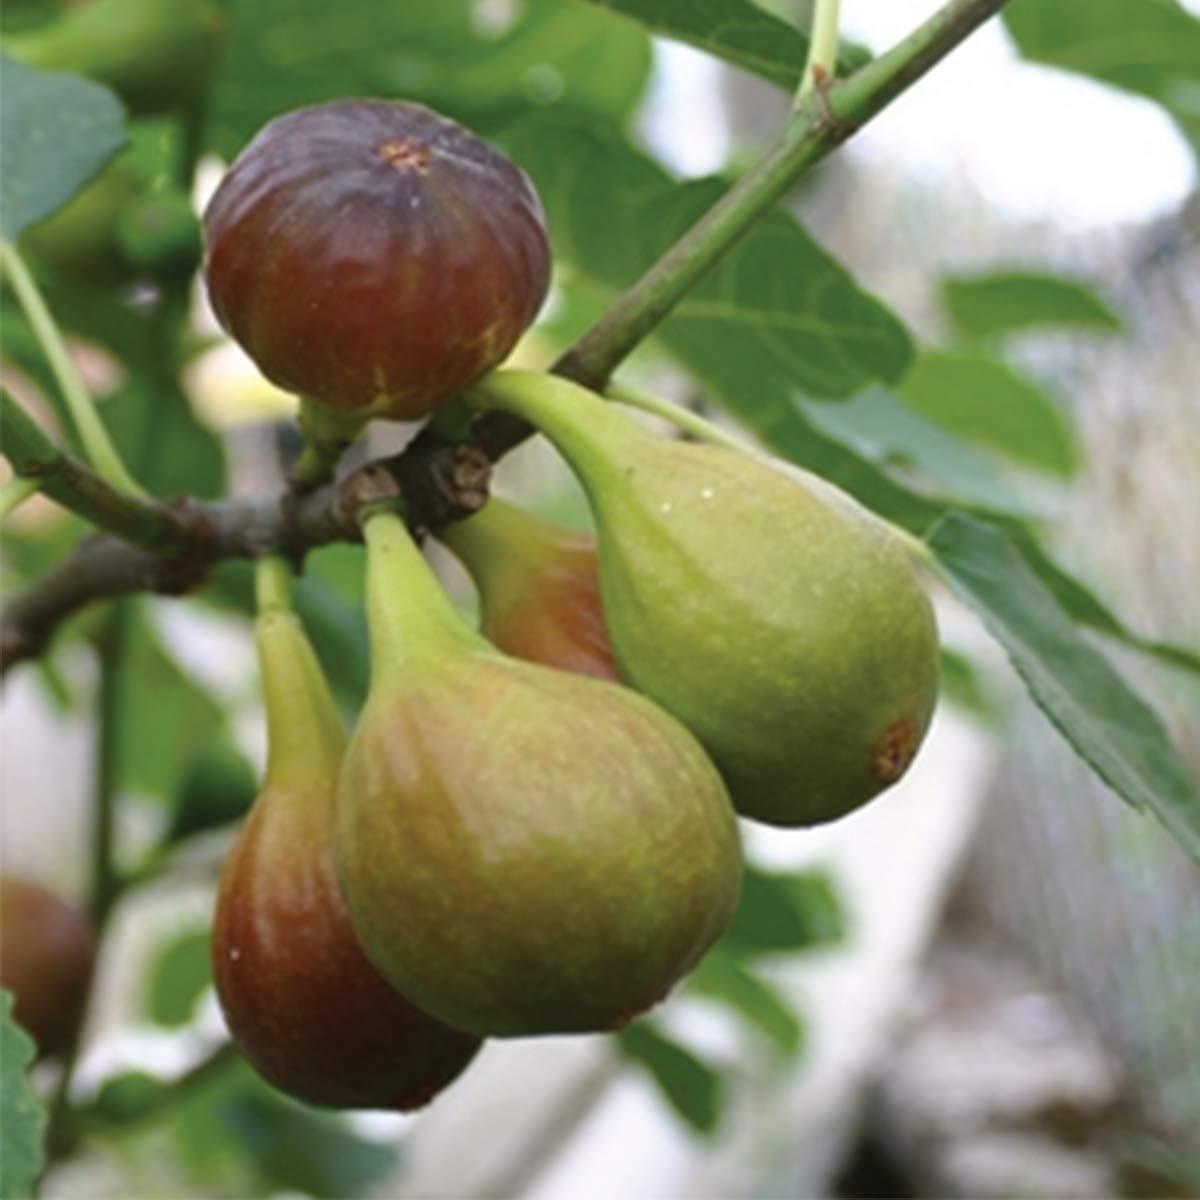 Burpee Chicago Hardy' Fig Fruit, 1 Plant